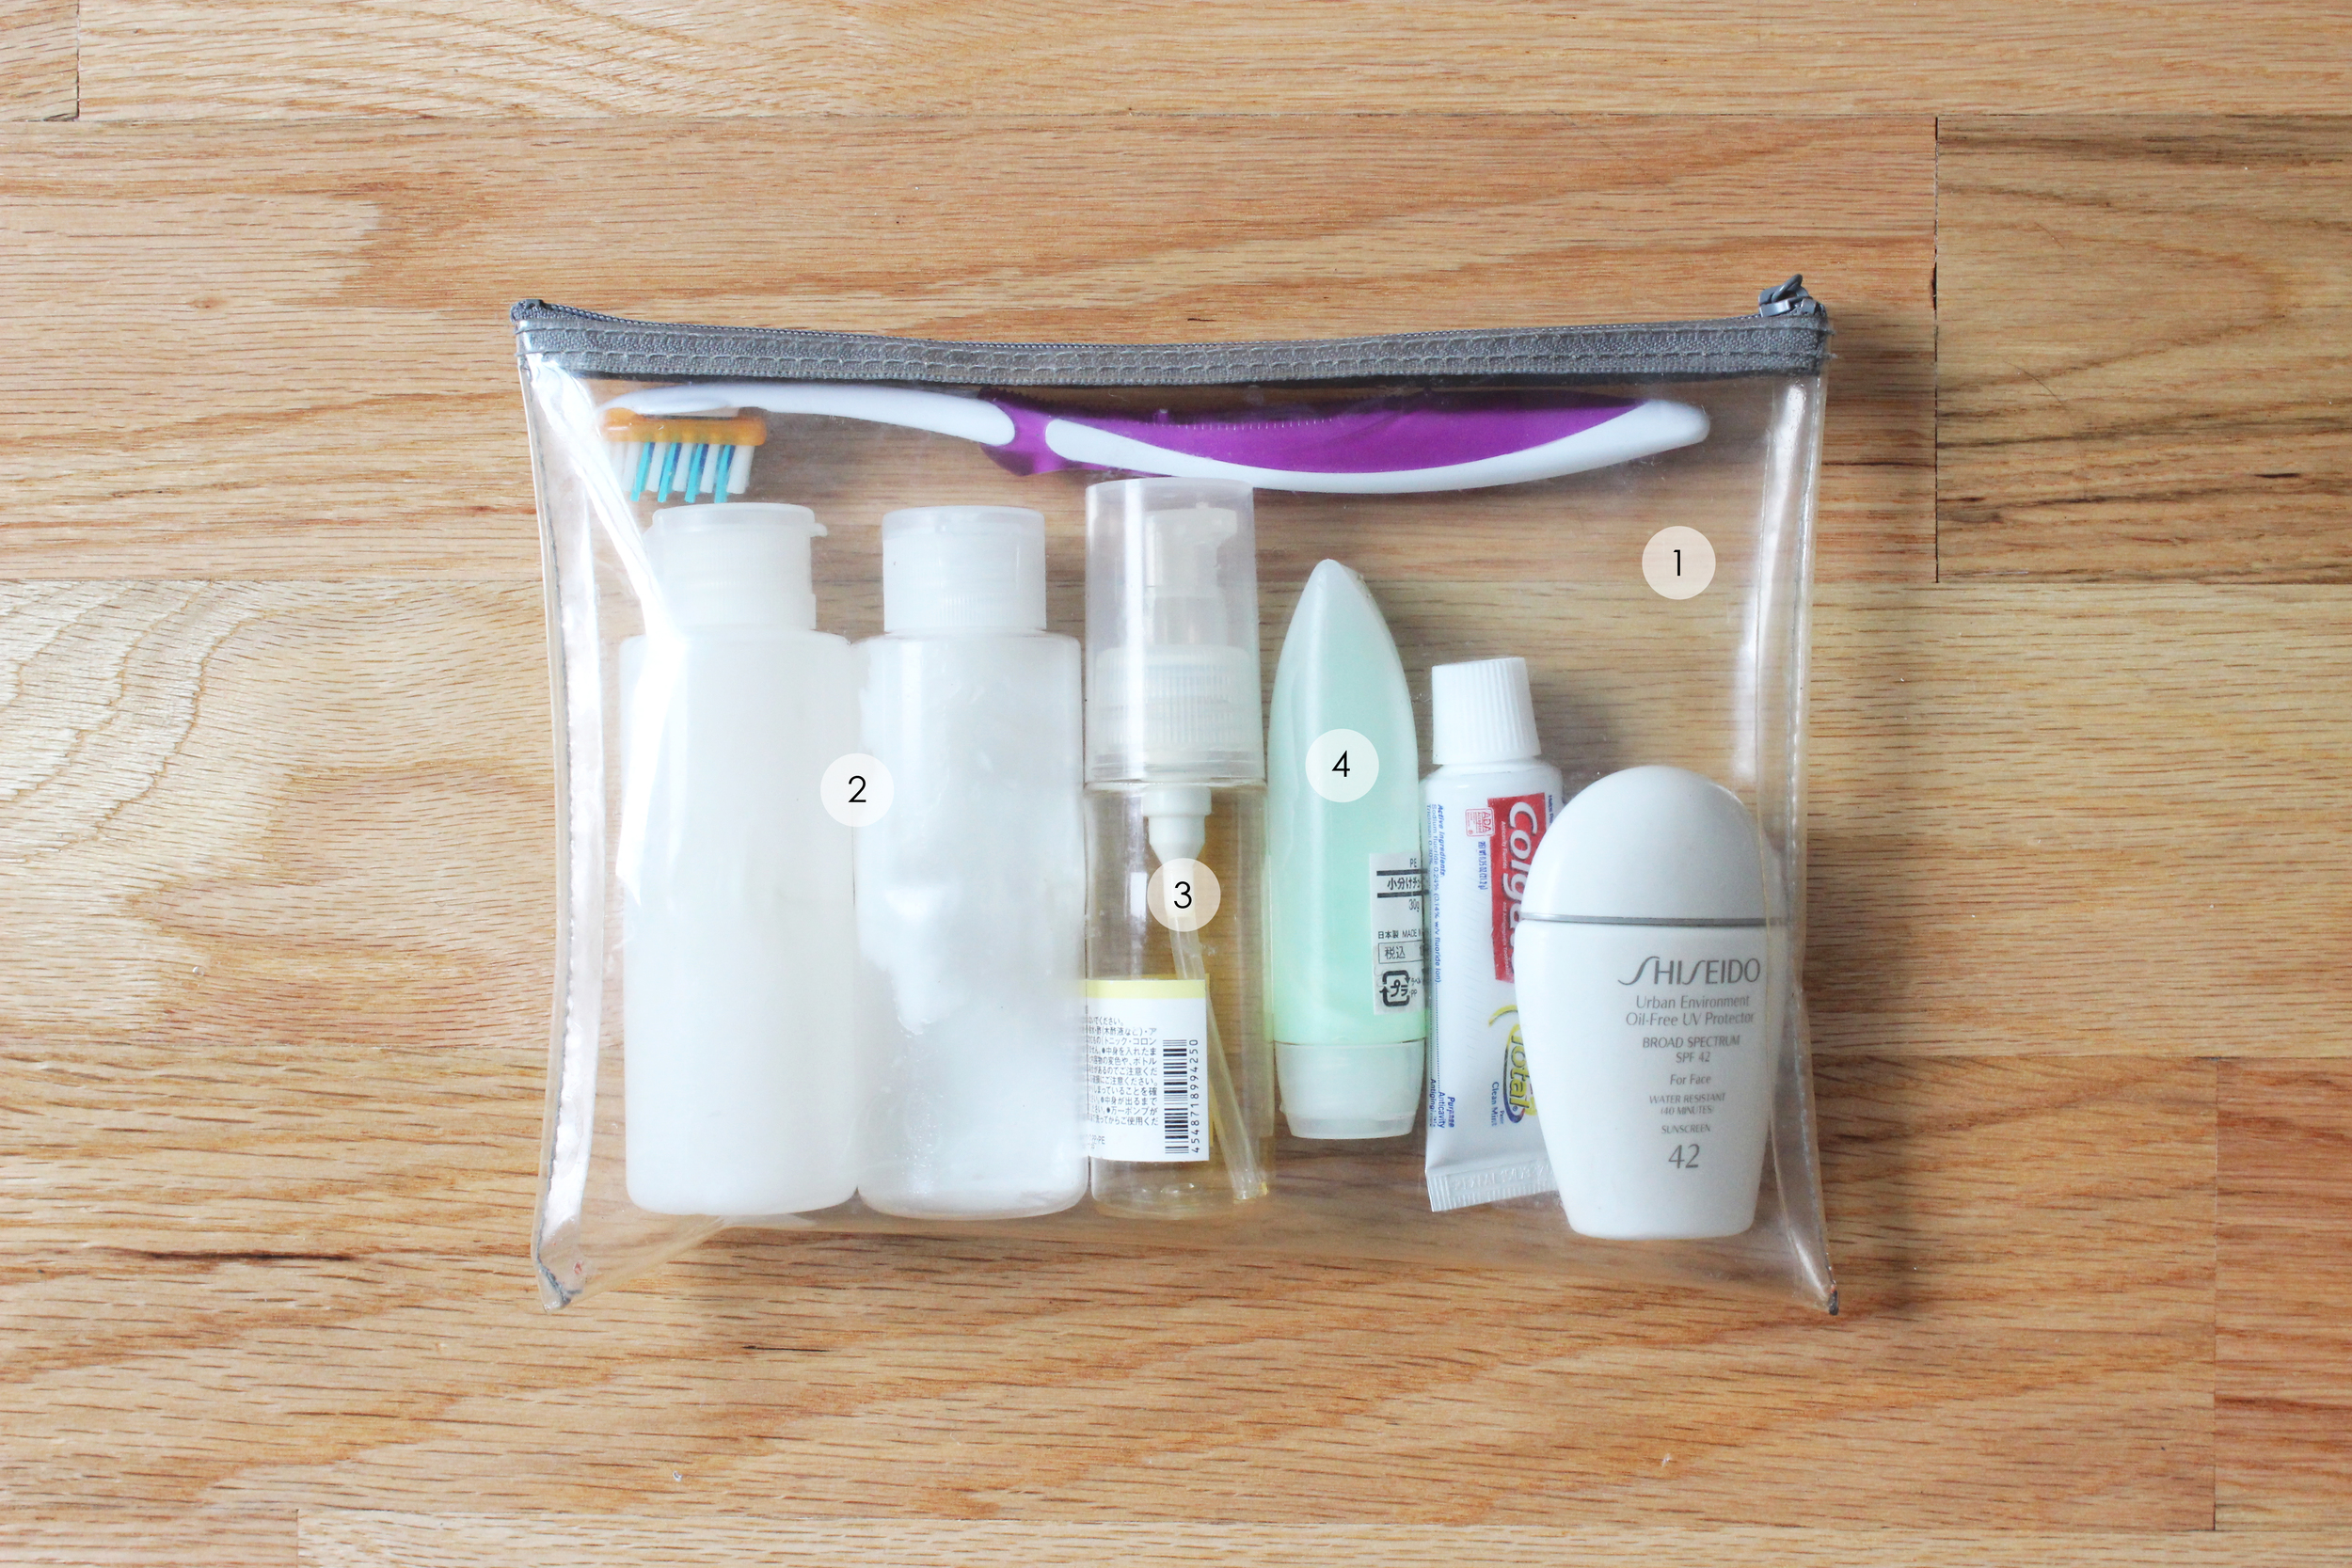 1. Toiletries case ( MUJI ) 2. Shampoo & conditioner bottles ( MUJI ) 3. Hair serum container ( MUJI ) 4. Face wash container ( MUJI )